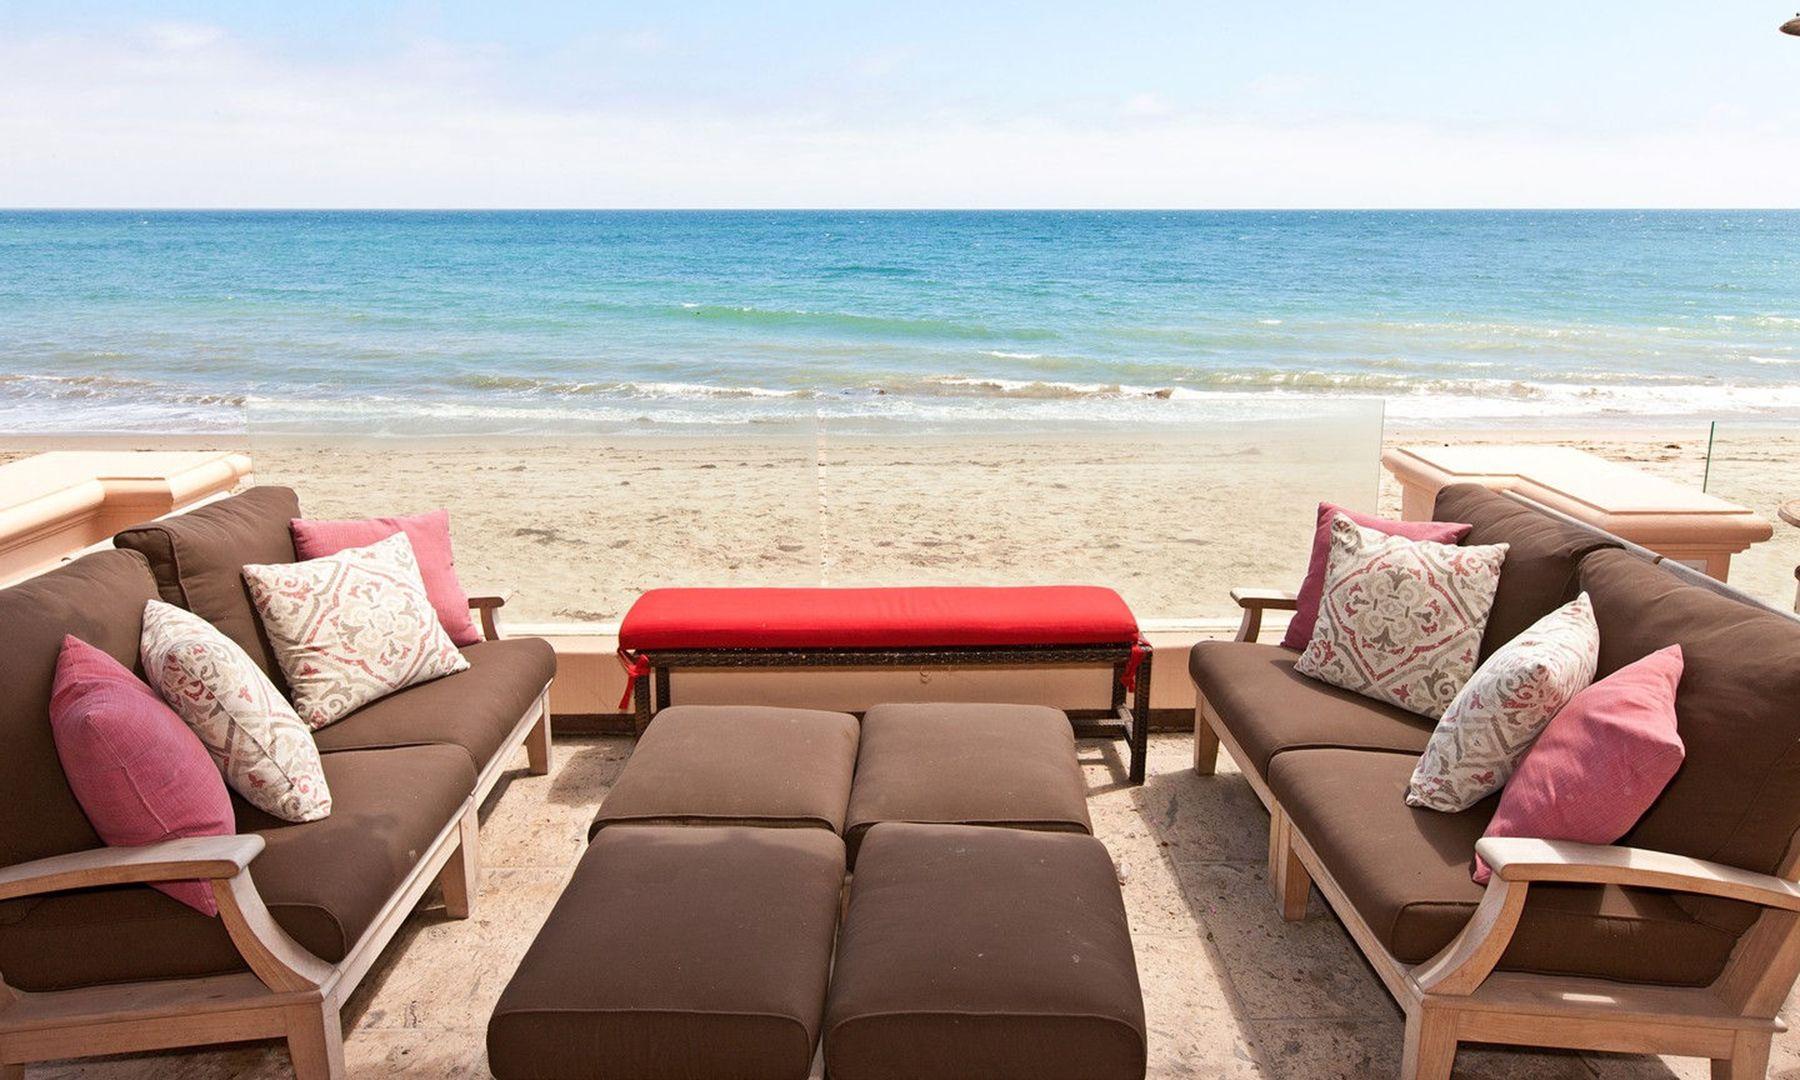 Mariah Carey's 30 Million Malibu Summer Rental Home